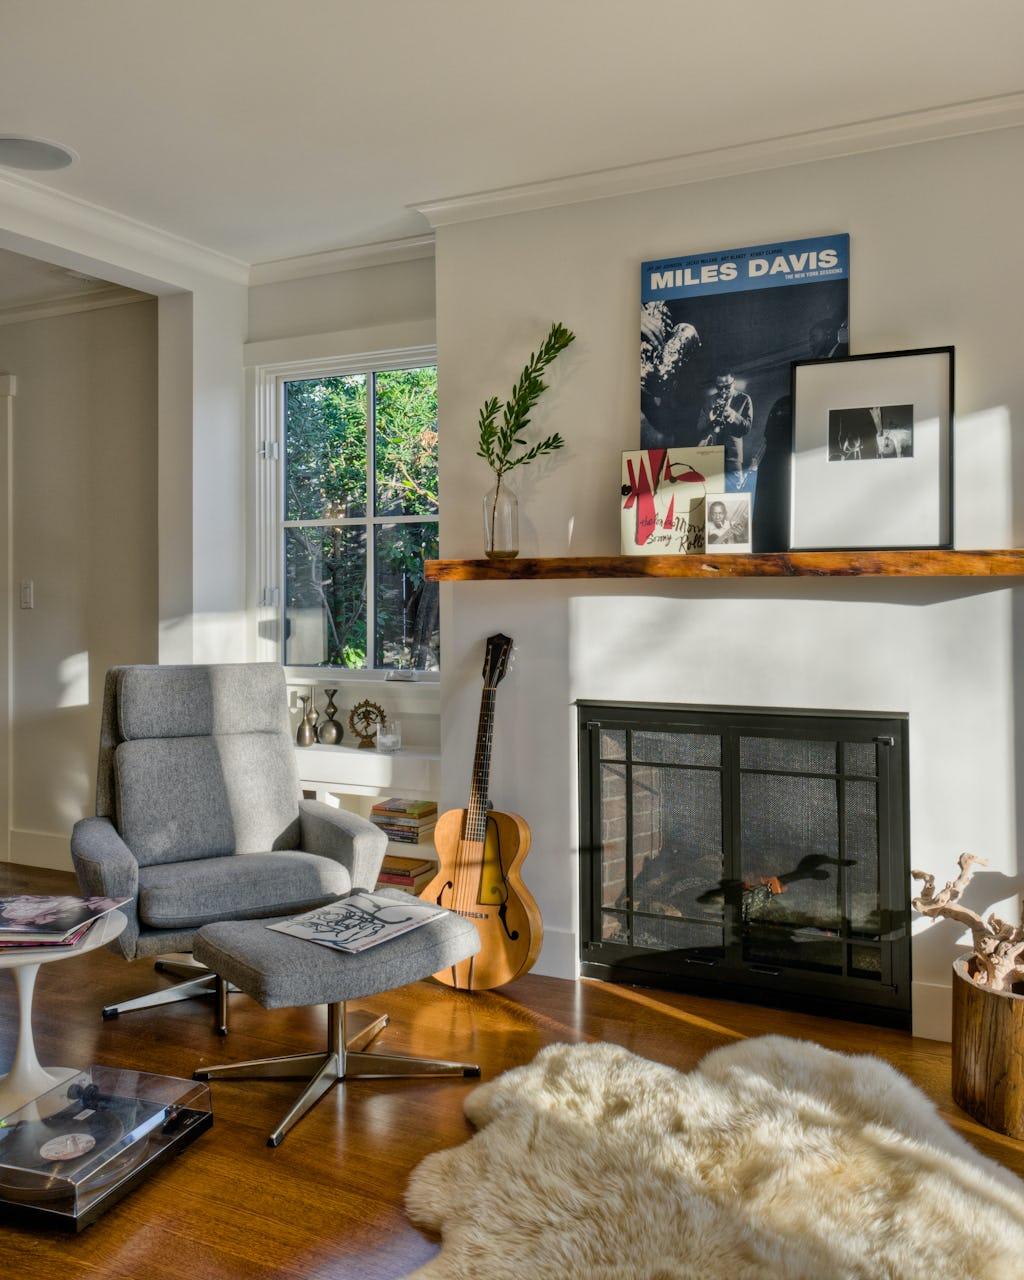 Studio karliova south court remodel interior design living room